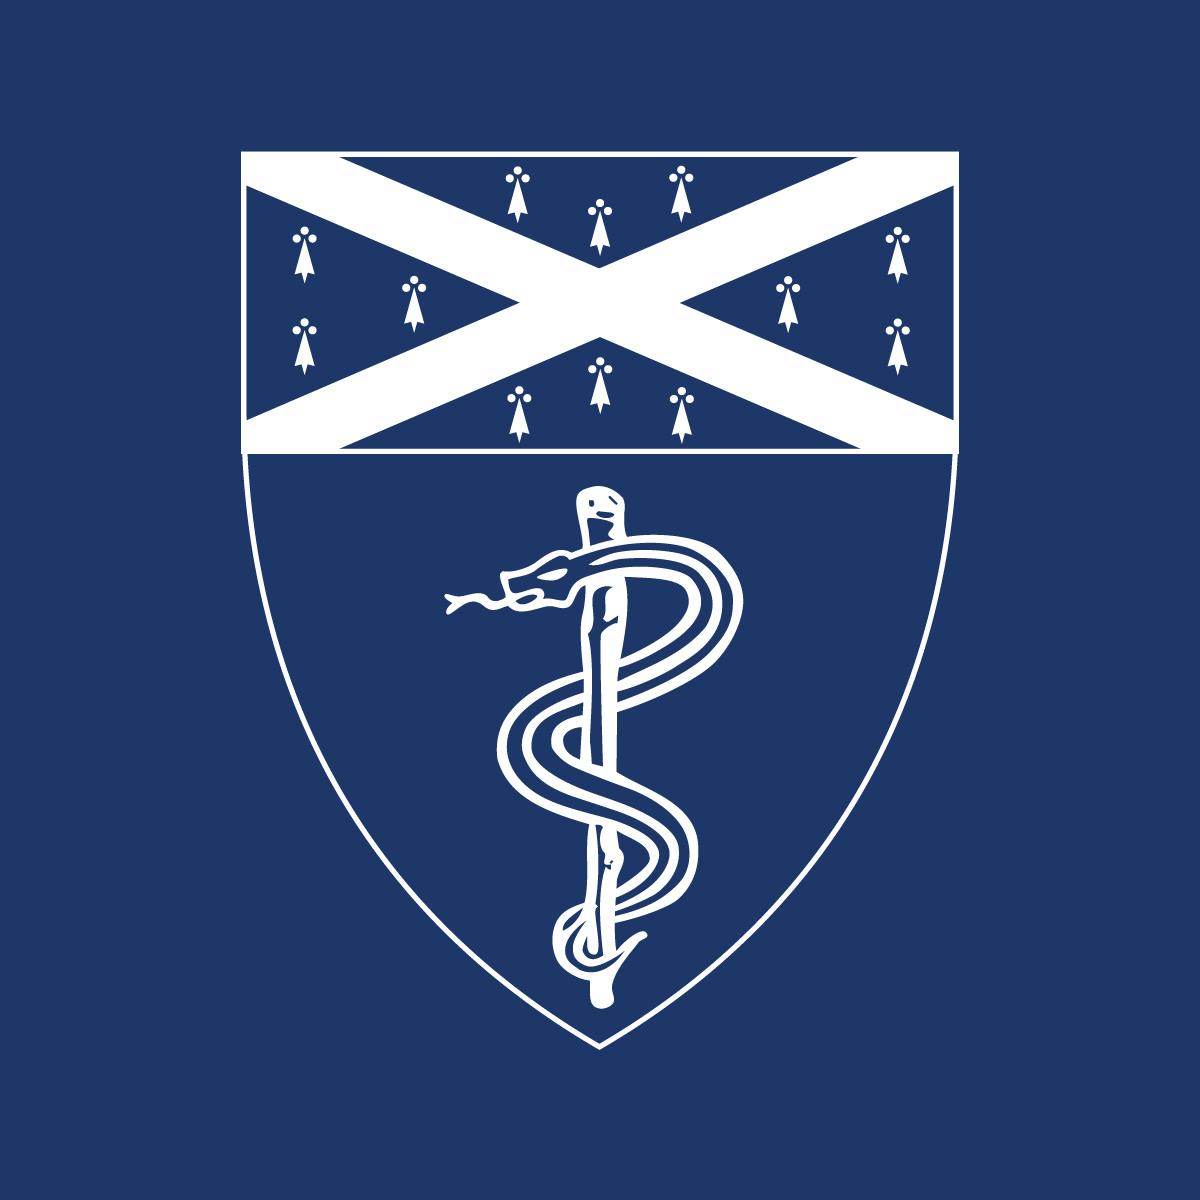 Yale School of Medicine Shield